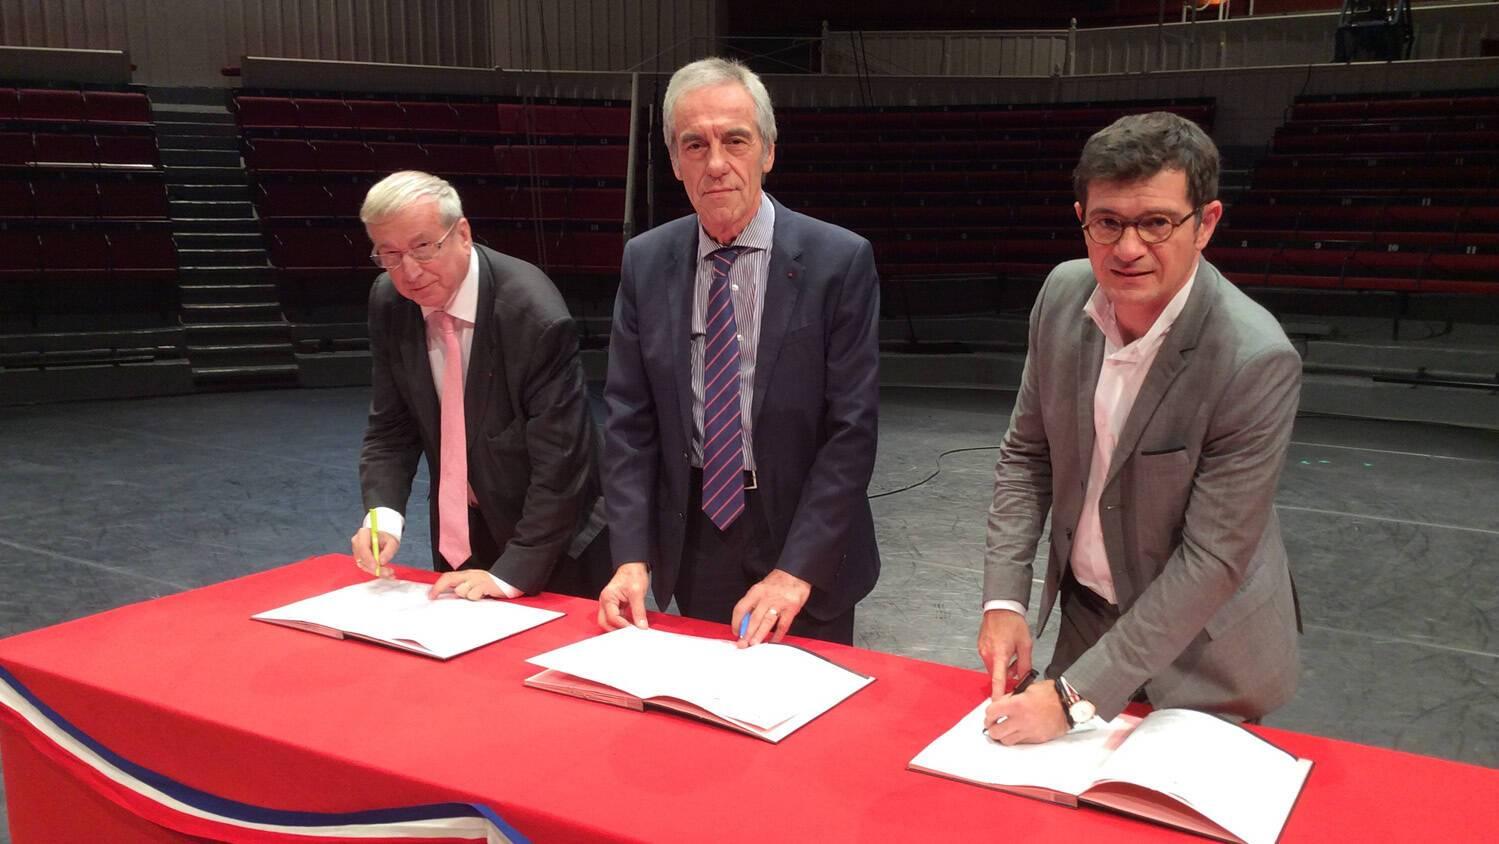 Bruno Bourg-Broc, Jean-François Savy et Benoist Apparu